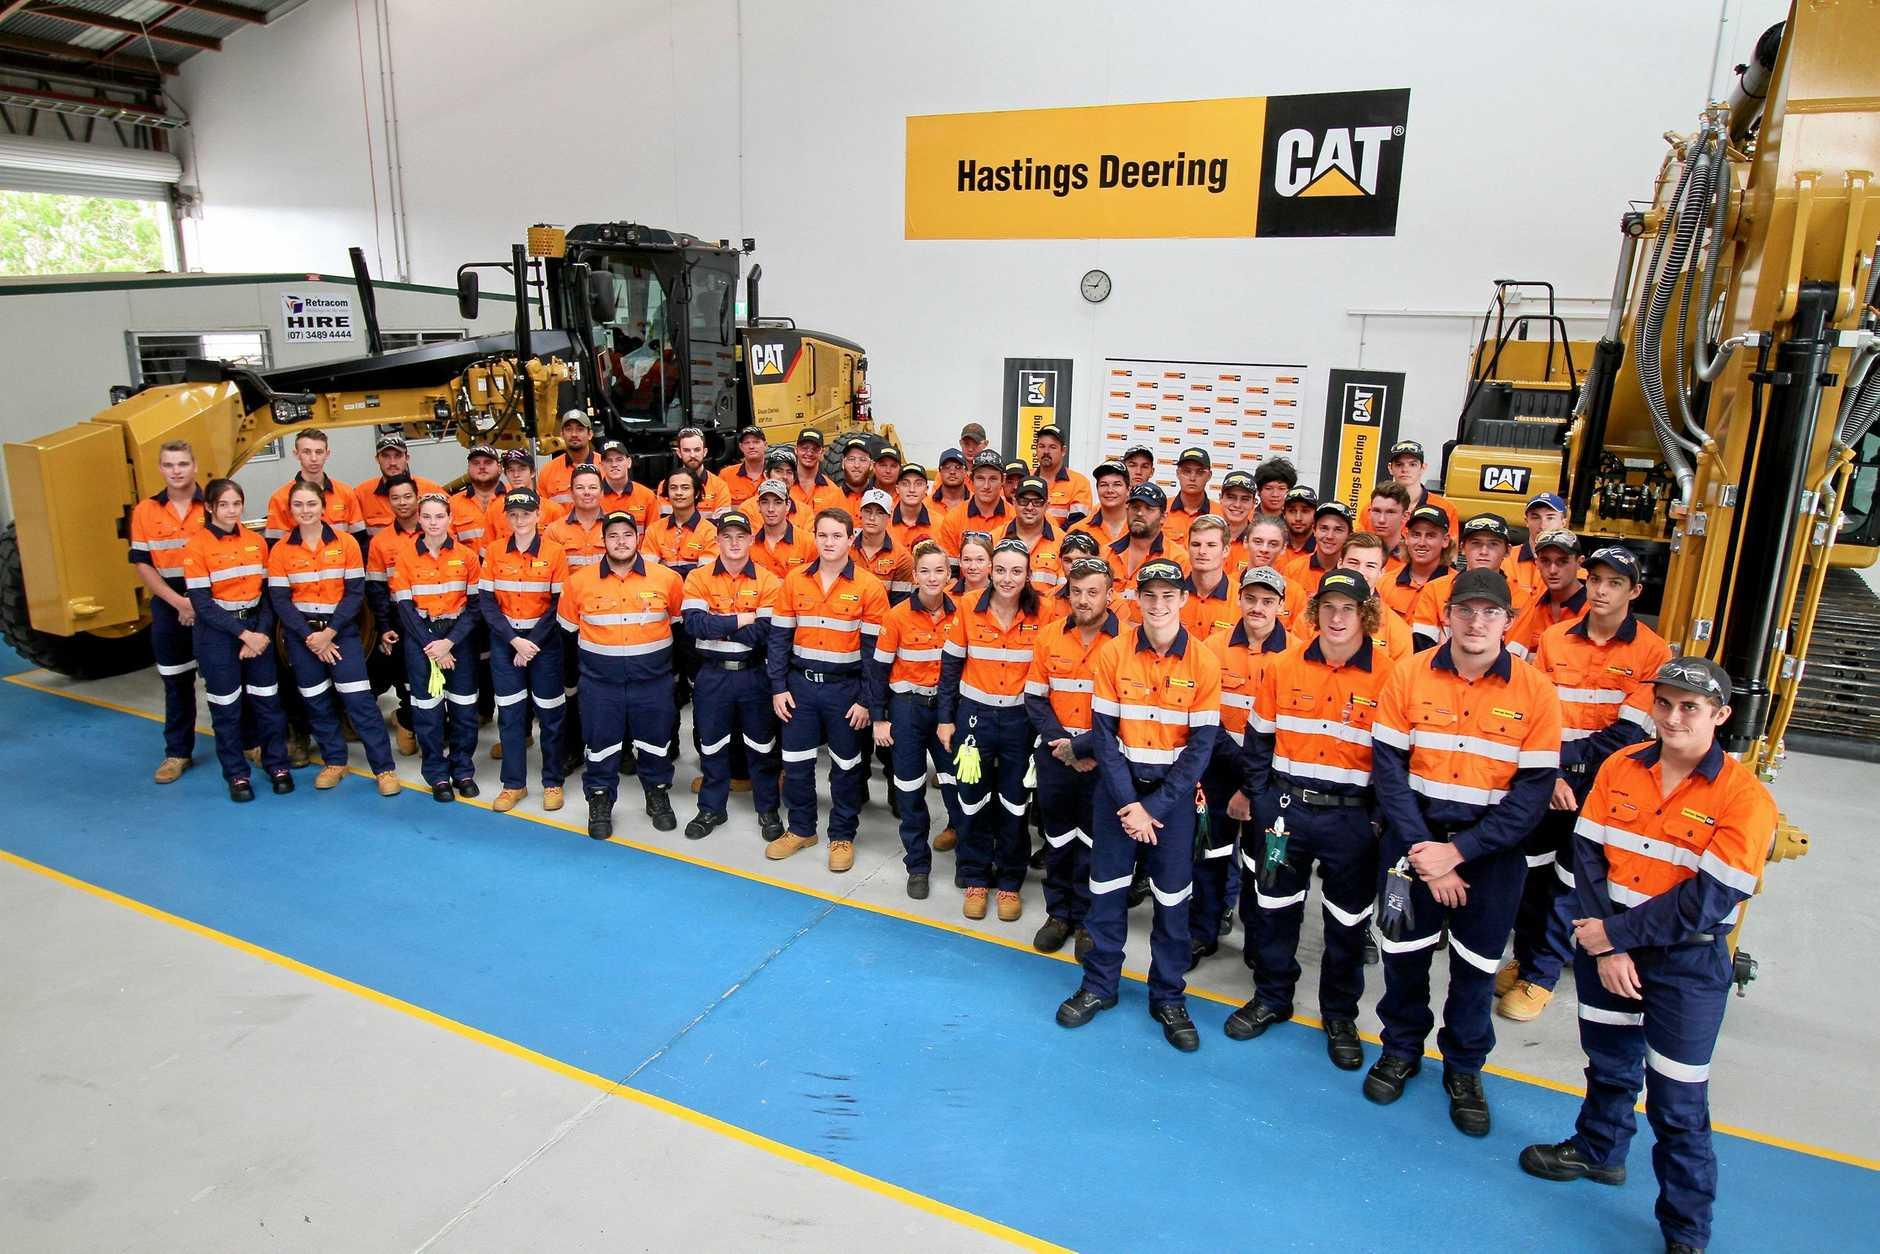 2019 Hastings Deering apprentice recruits